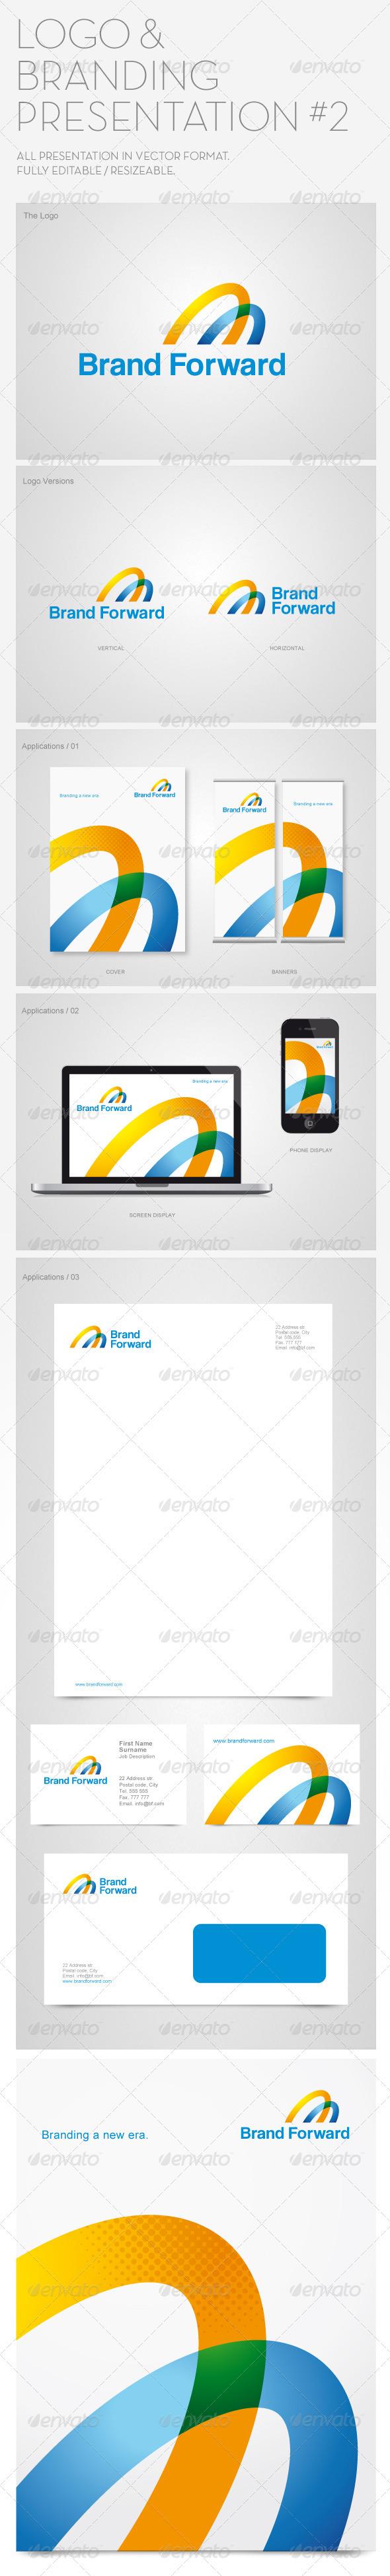 Logo & Branding Presentation #2 - Logo Templates